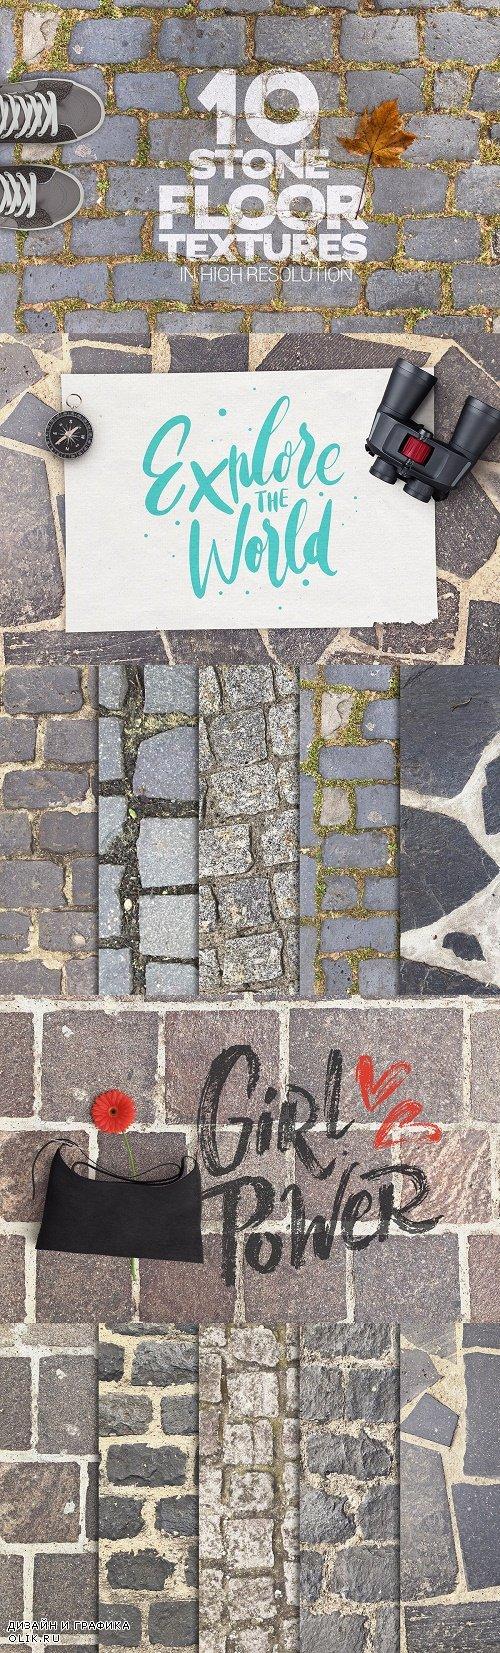 Stone Floor Textures x10 - 3811532